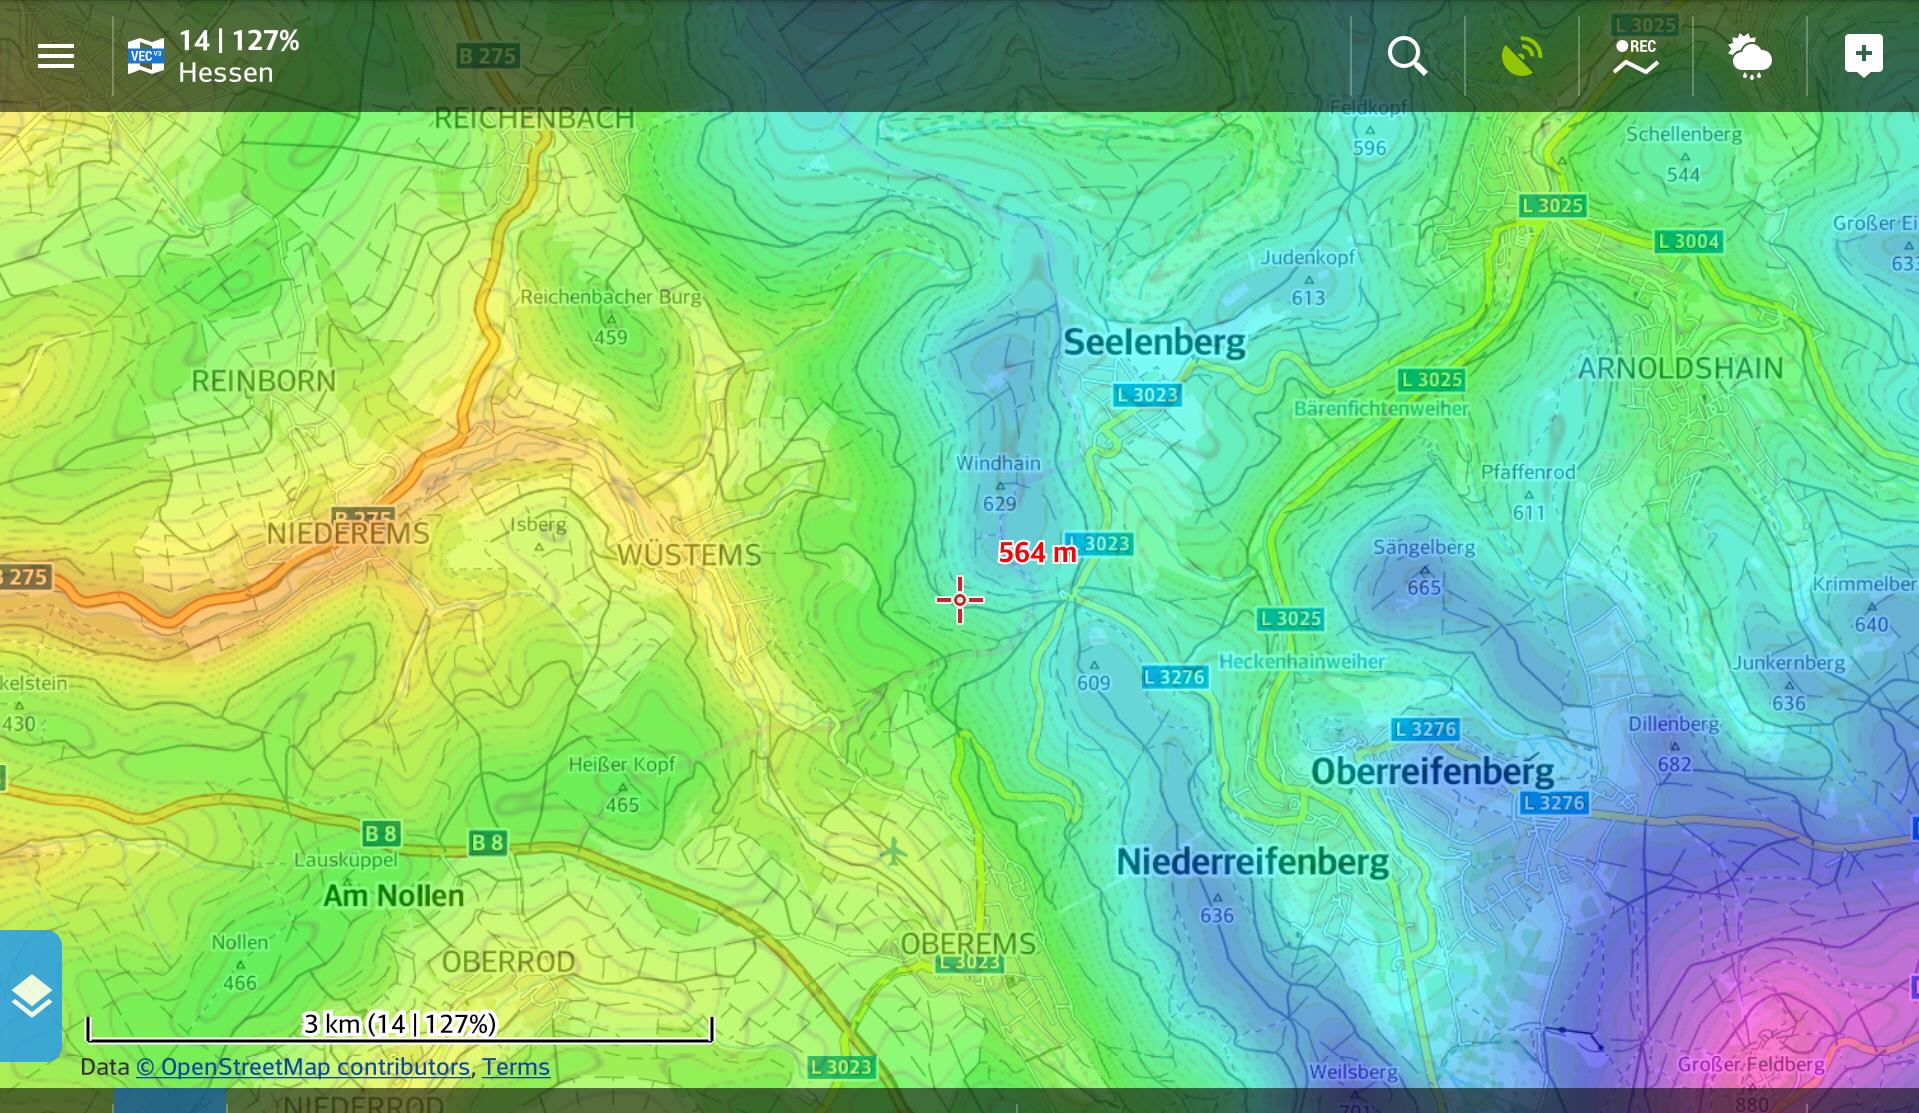 Altitude map (altitude as color gradient)